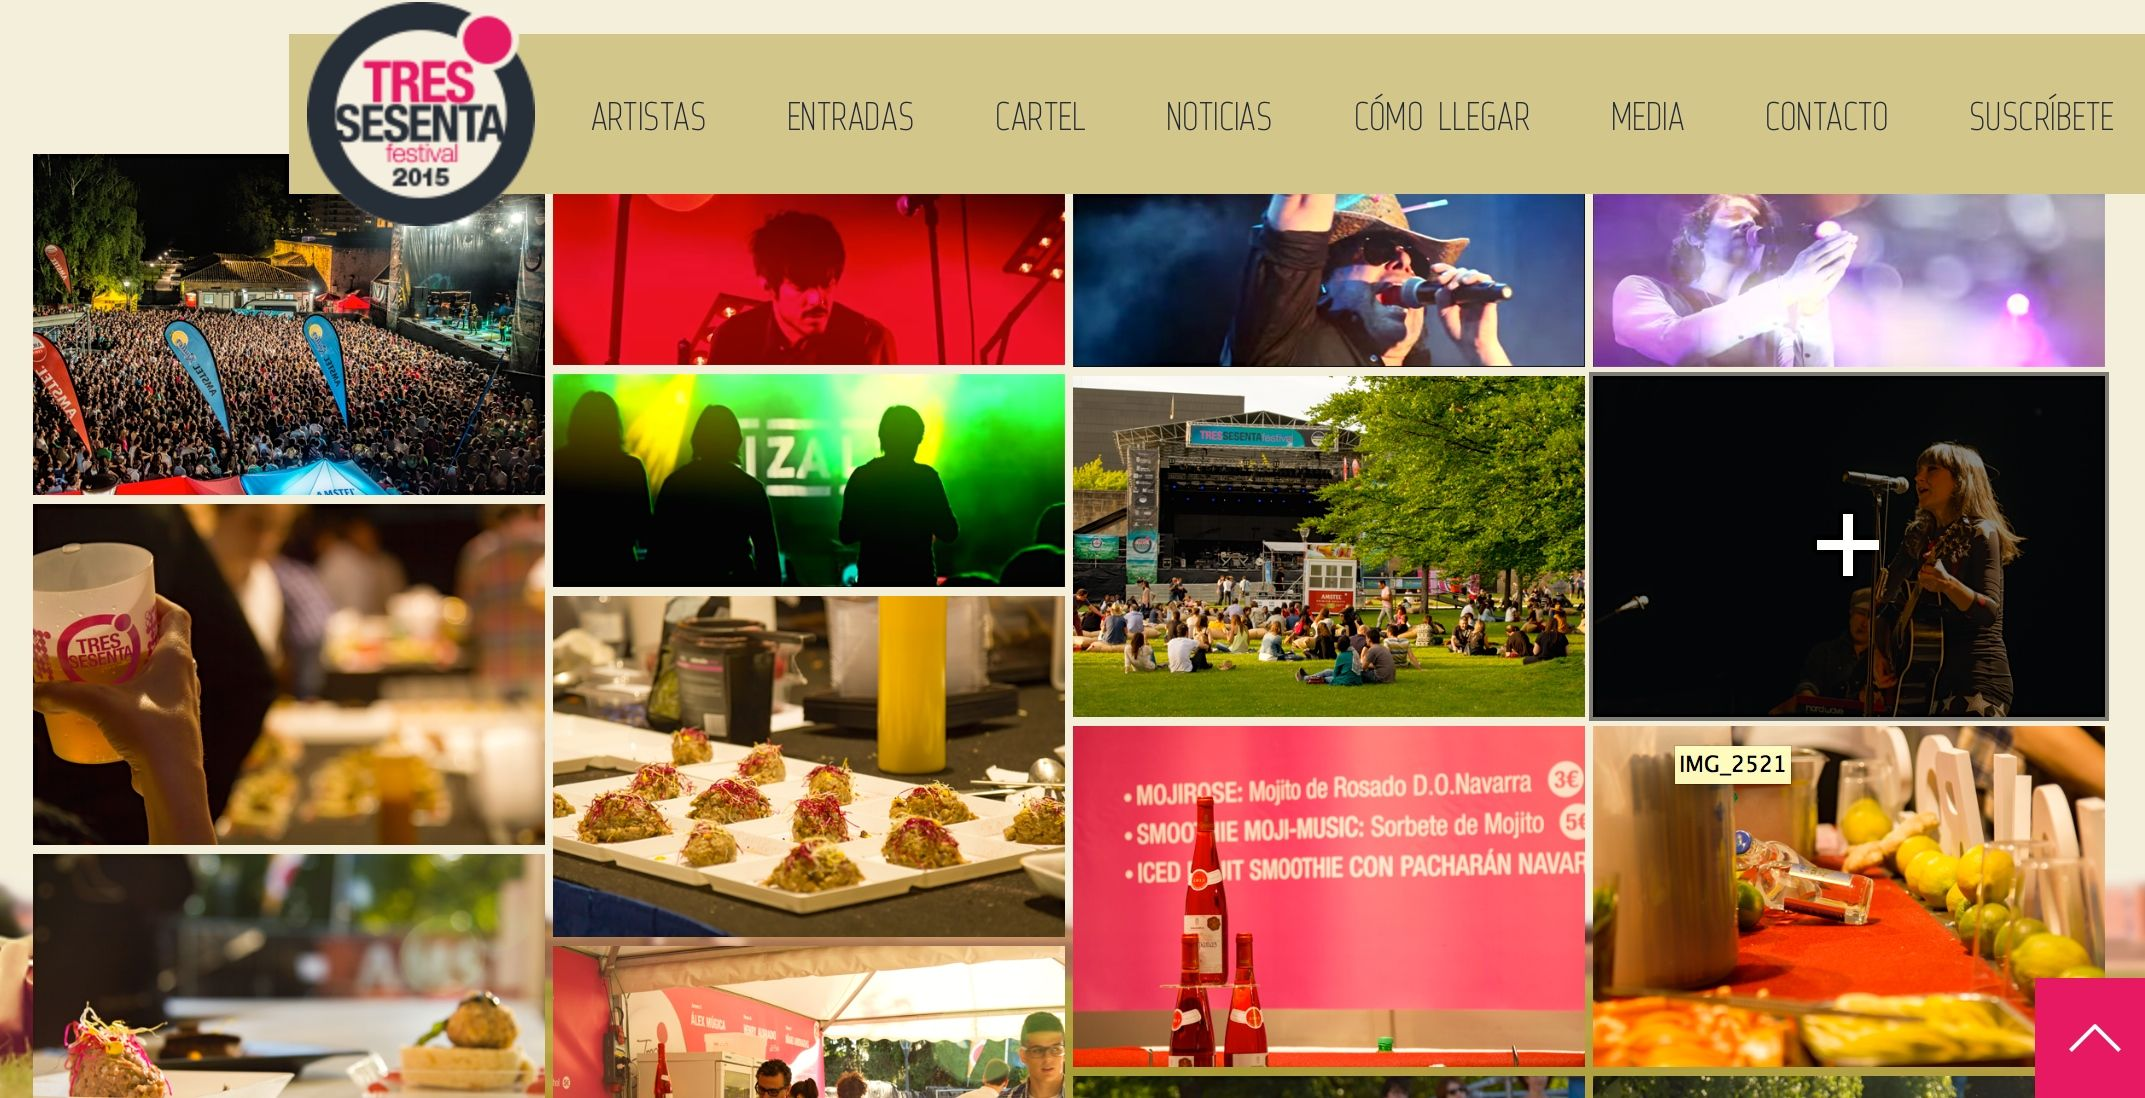 Página web oficial del Tres Sesenta Festival